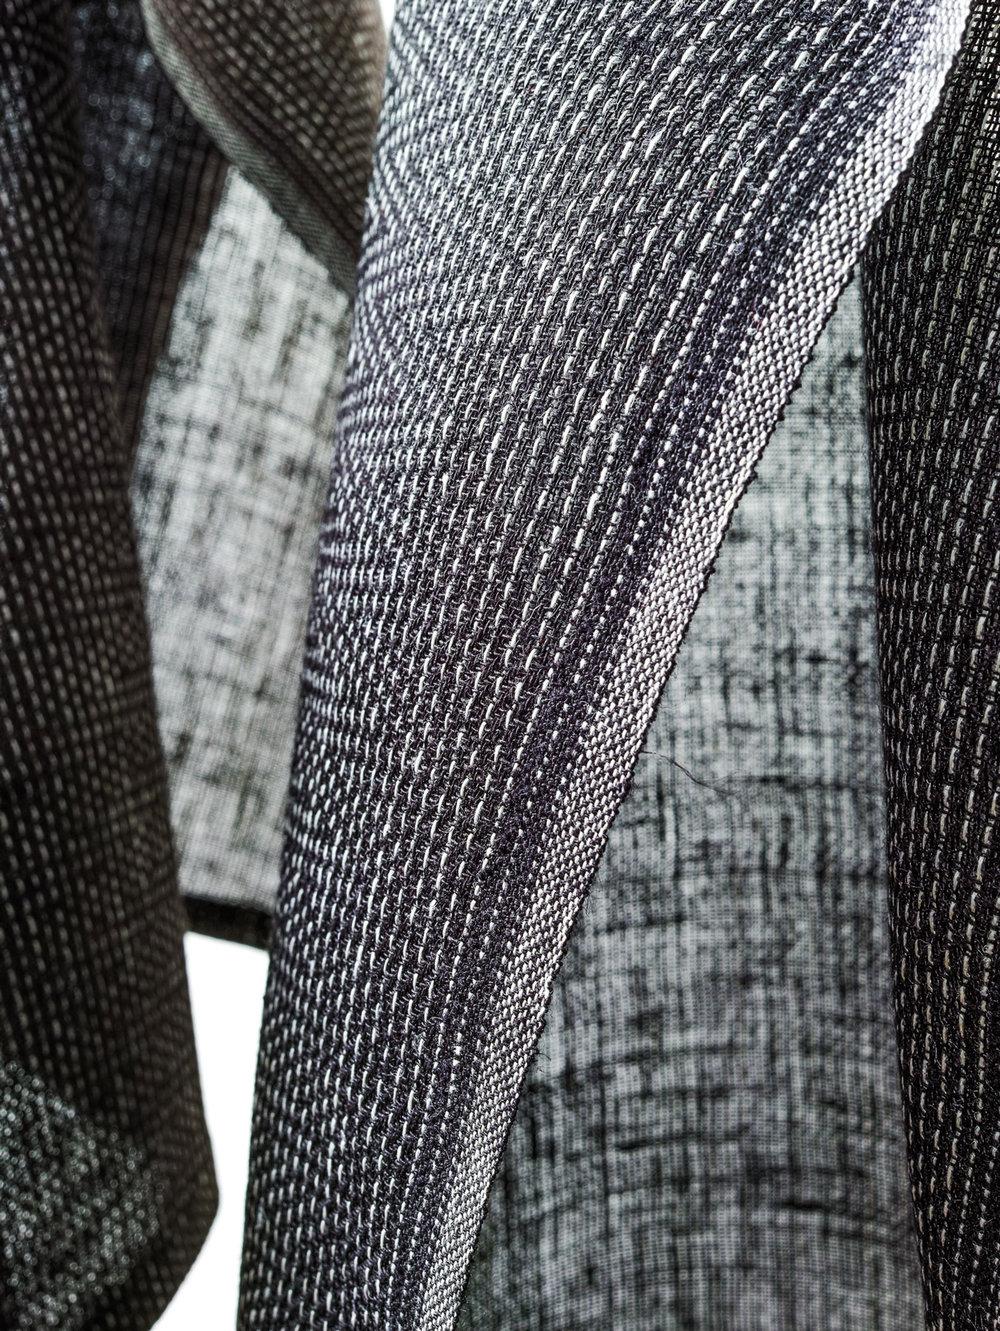 Karin Carlander - TEXTILE NO. Zigzag Design - Natural Linen